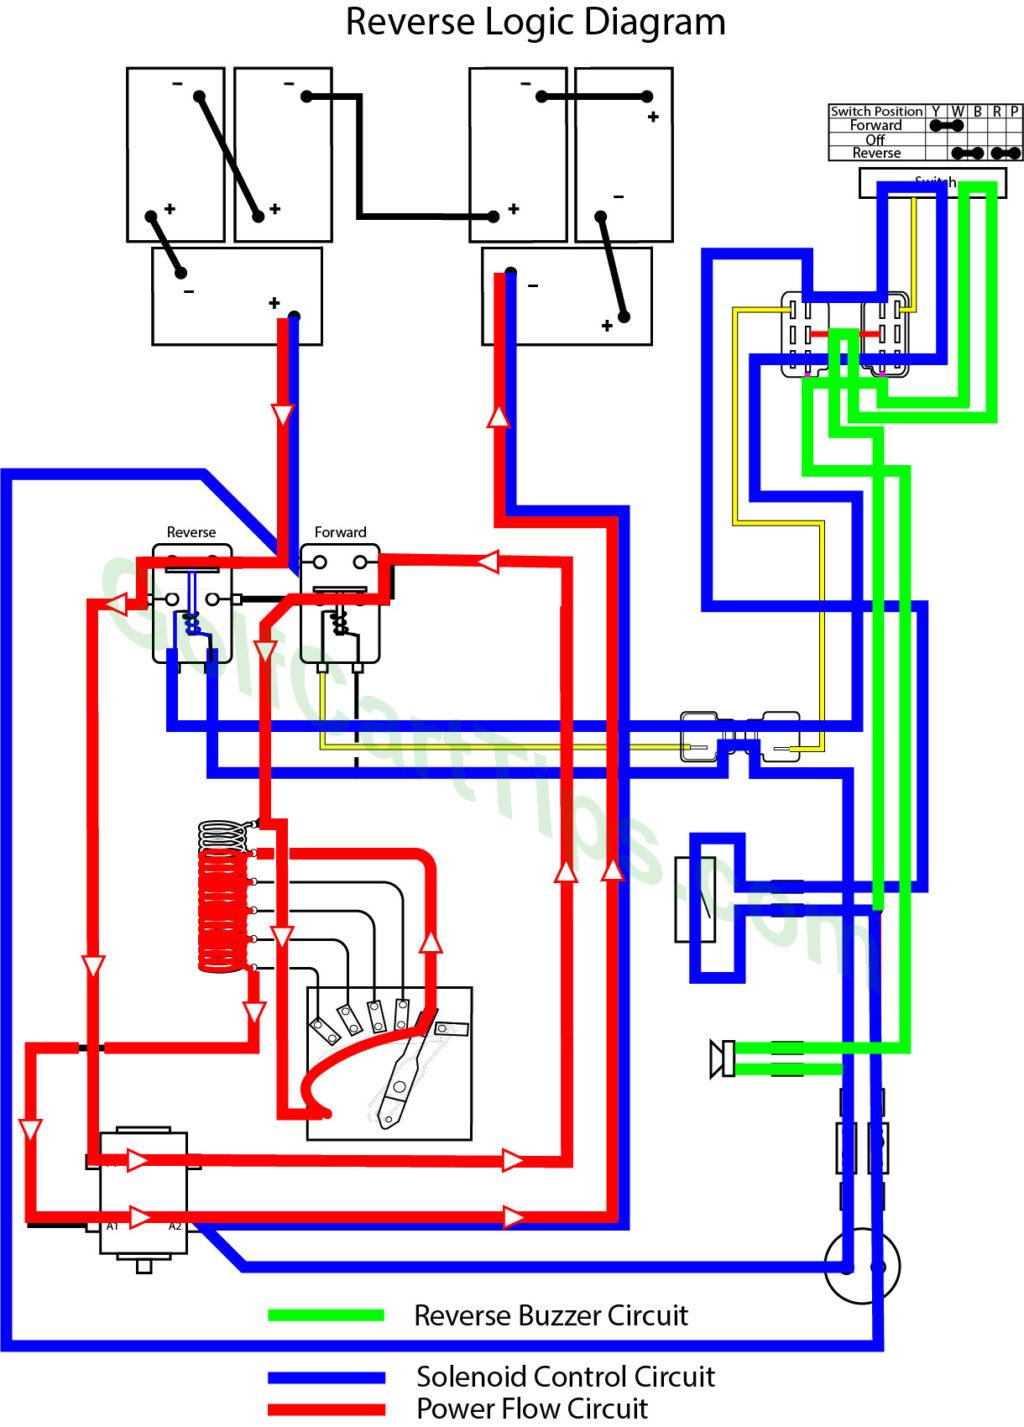 [DIAGRAM_38ZD]  WX_5523] Reverse Buzzer Wiring Diagram Download Diagram | Wiring Diagram Vtech Cogsley |  | Viewor Proe Taliz Sheox Faun Unde Itive Icaen Jitt Hapolo Phae  Mohammedshrine Librar Wiring 101